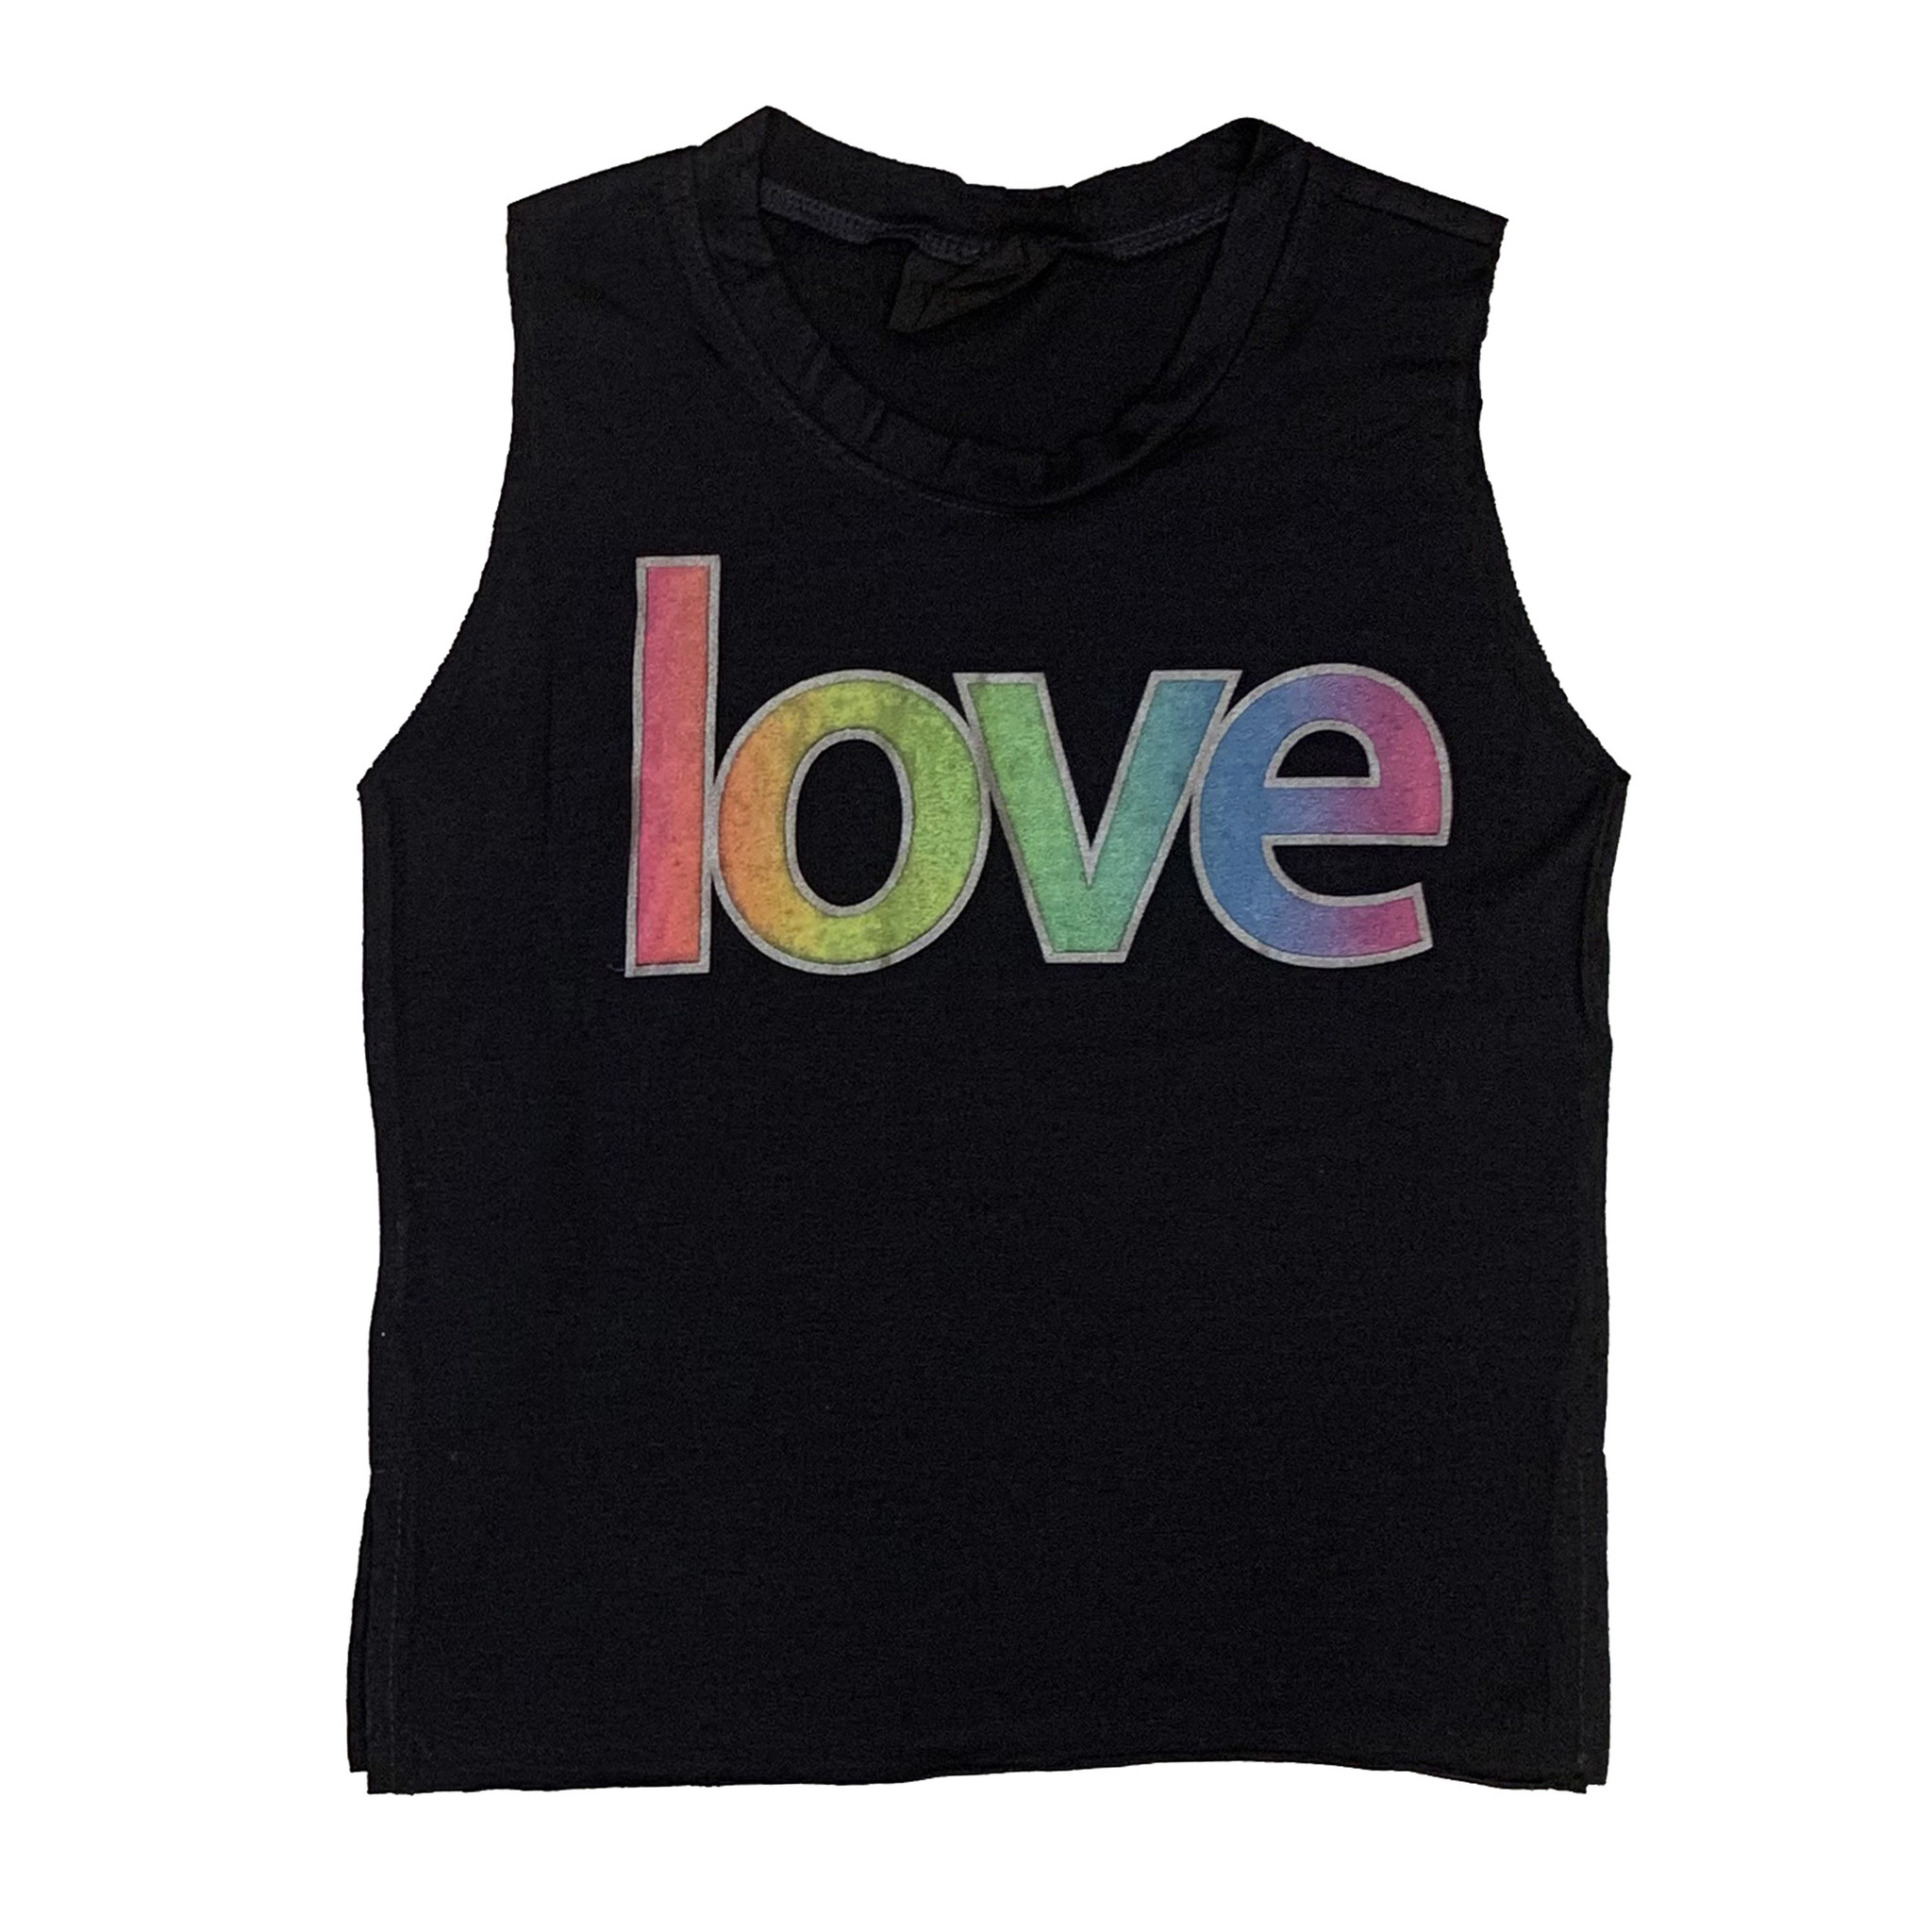 Firehouse Rainbow Love Muscle Tank